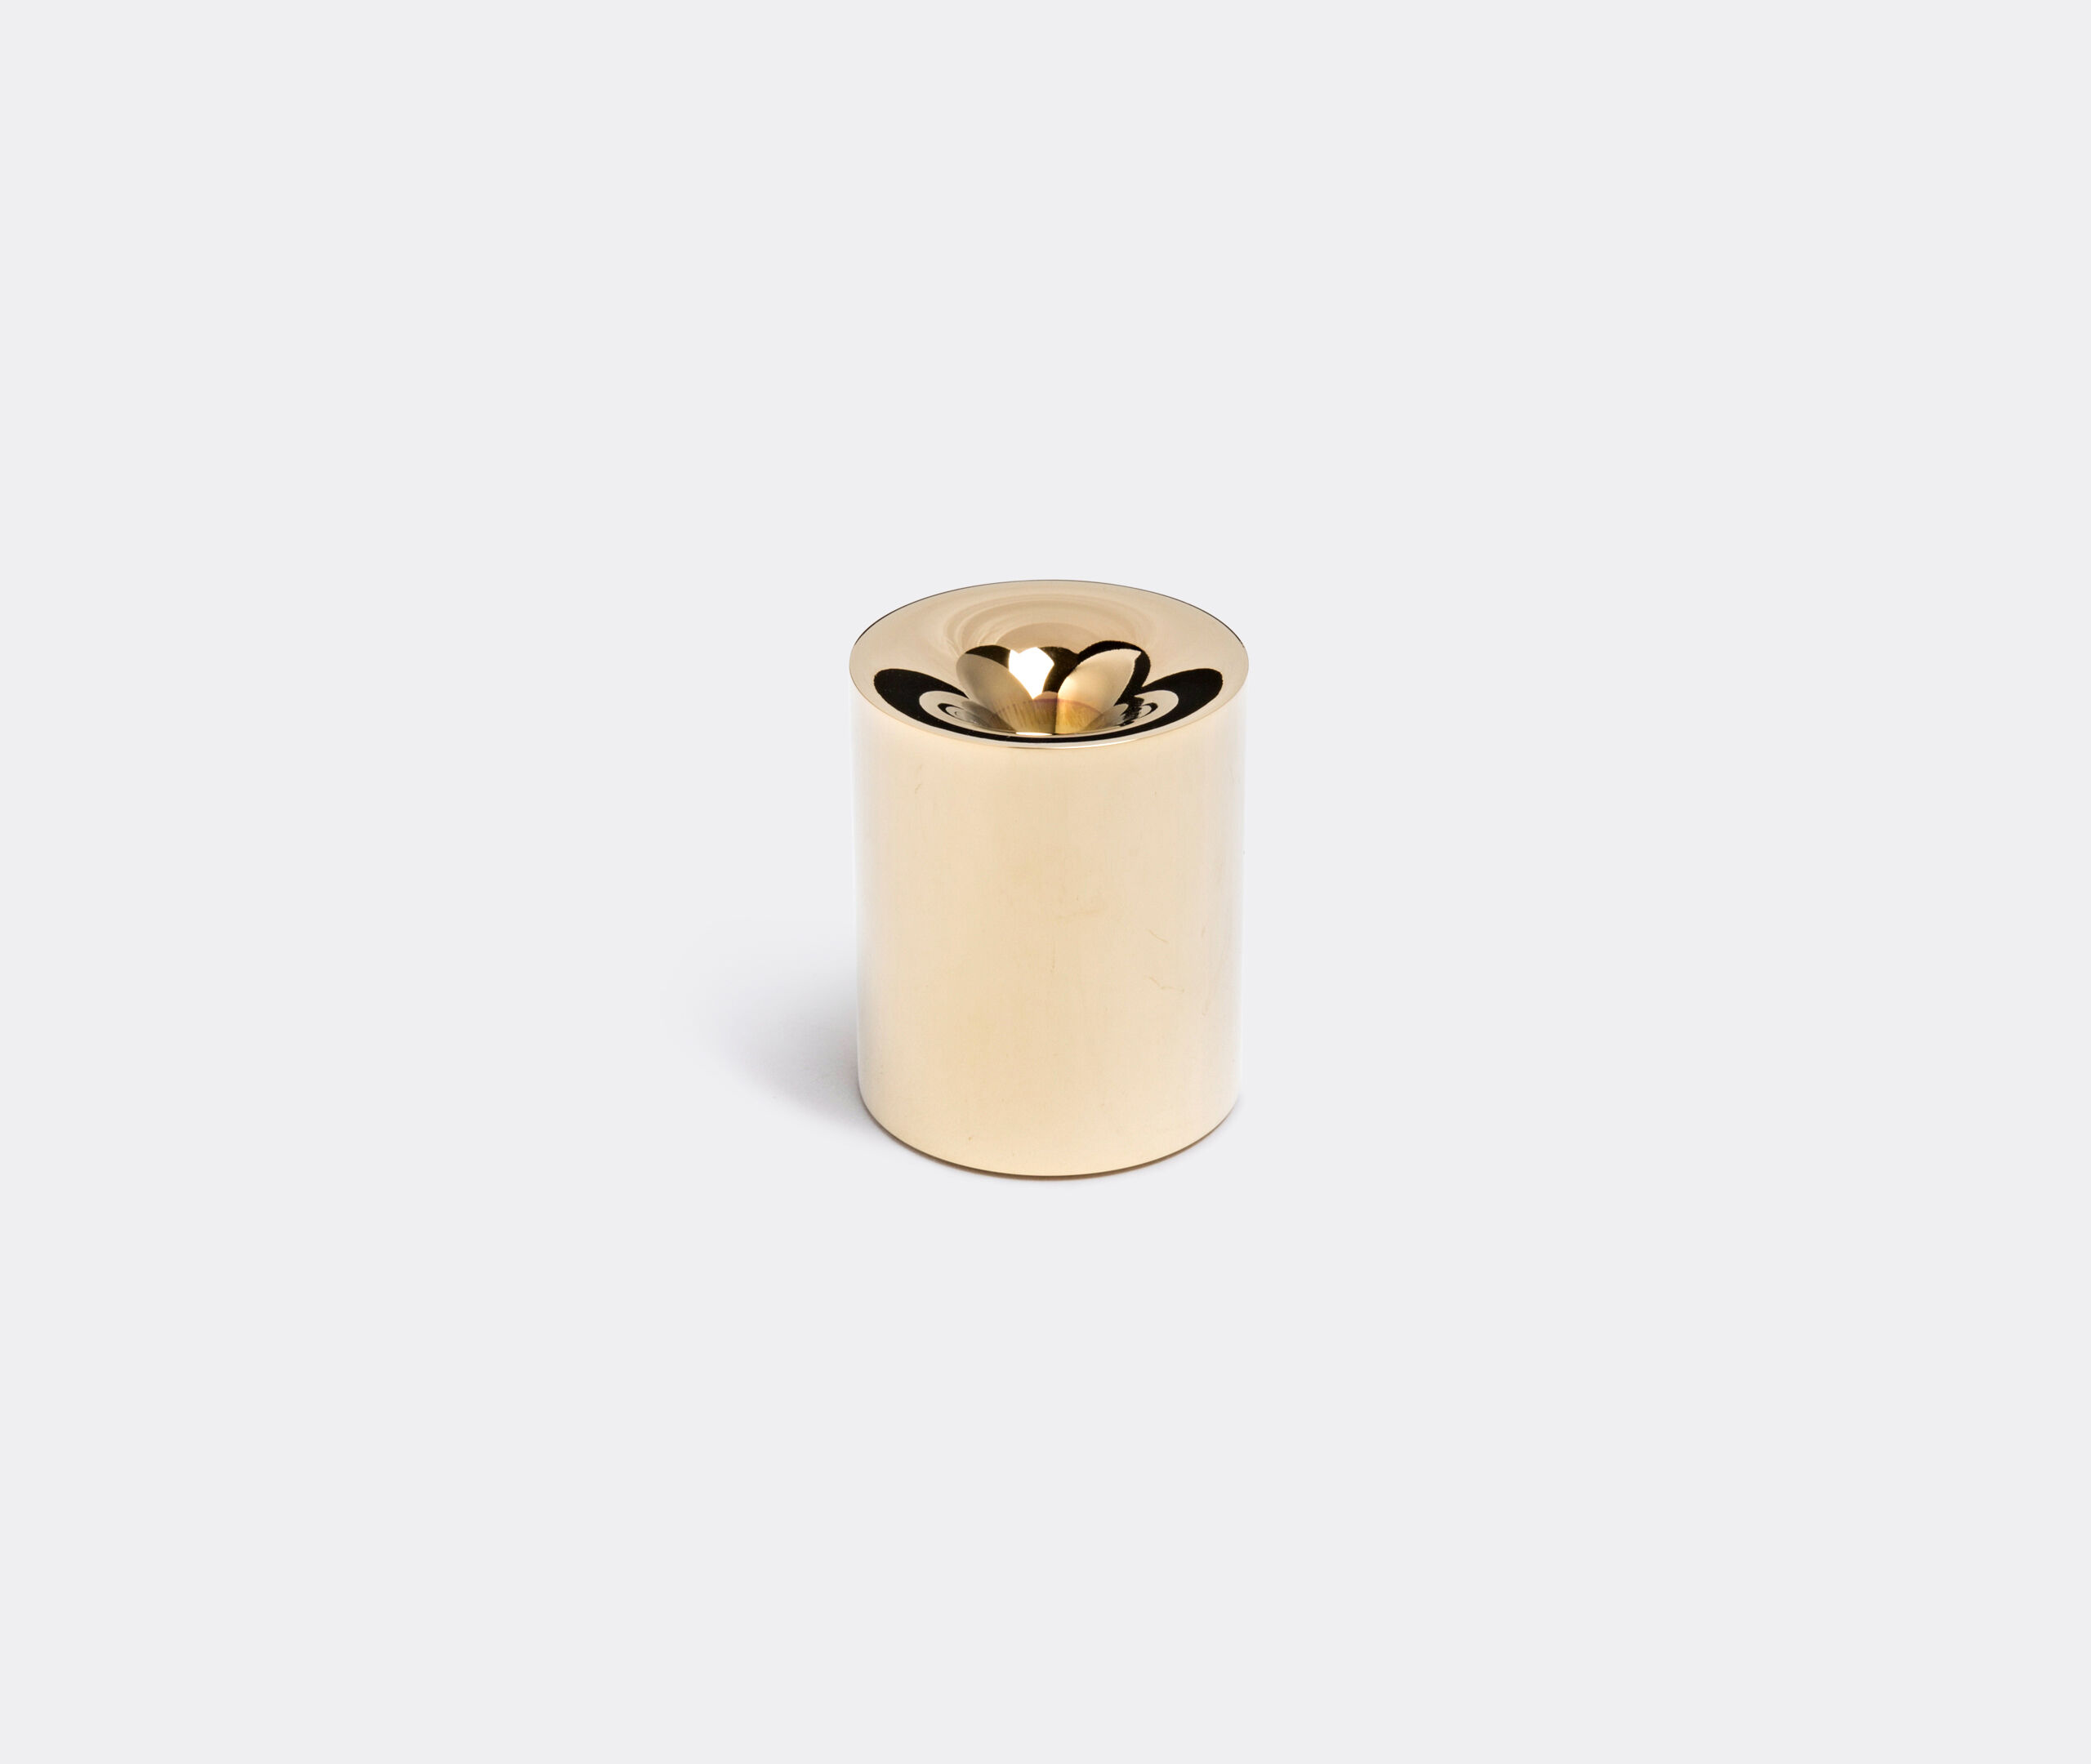 Funno Pencil Sharpener / Paper Weight